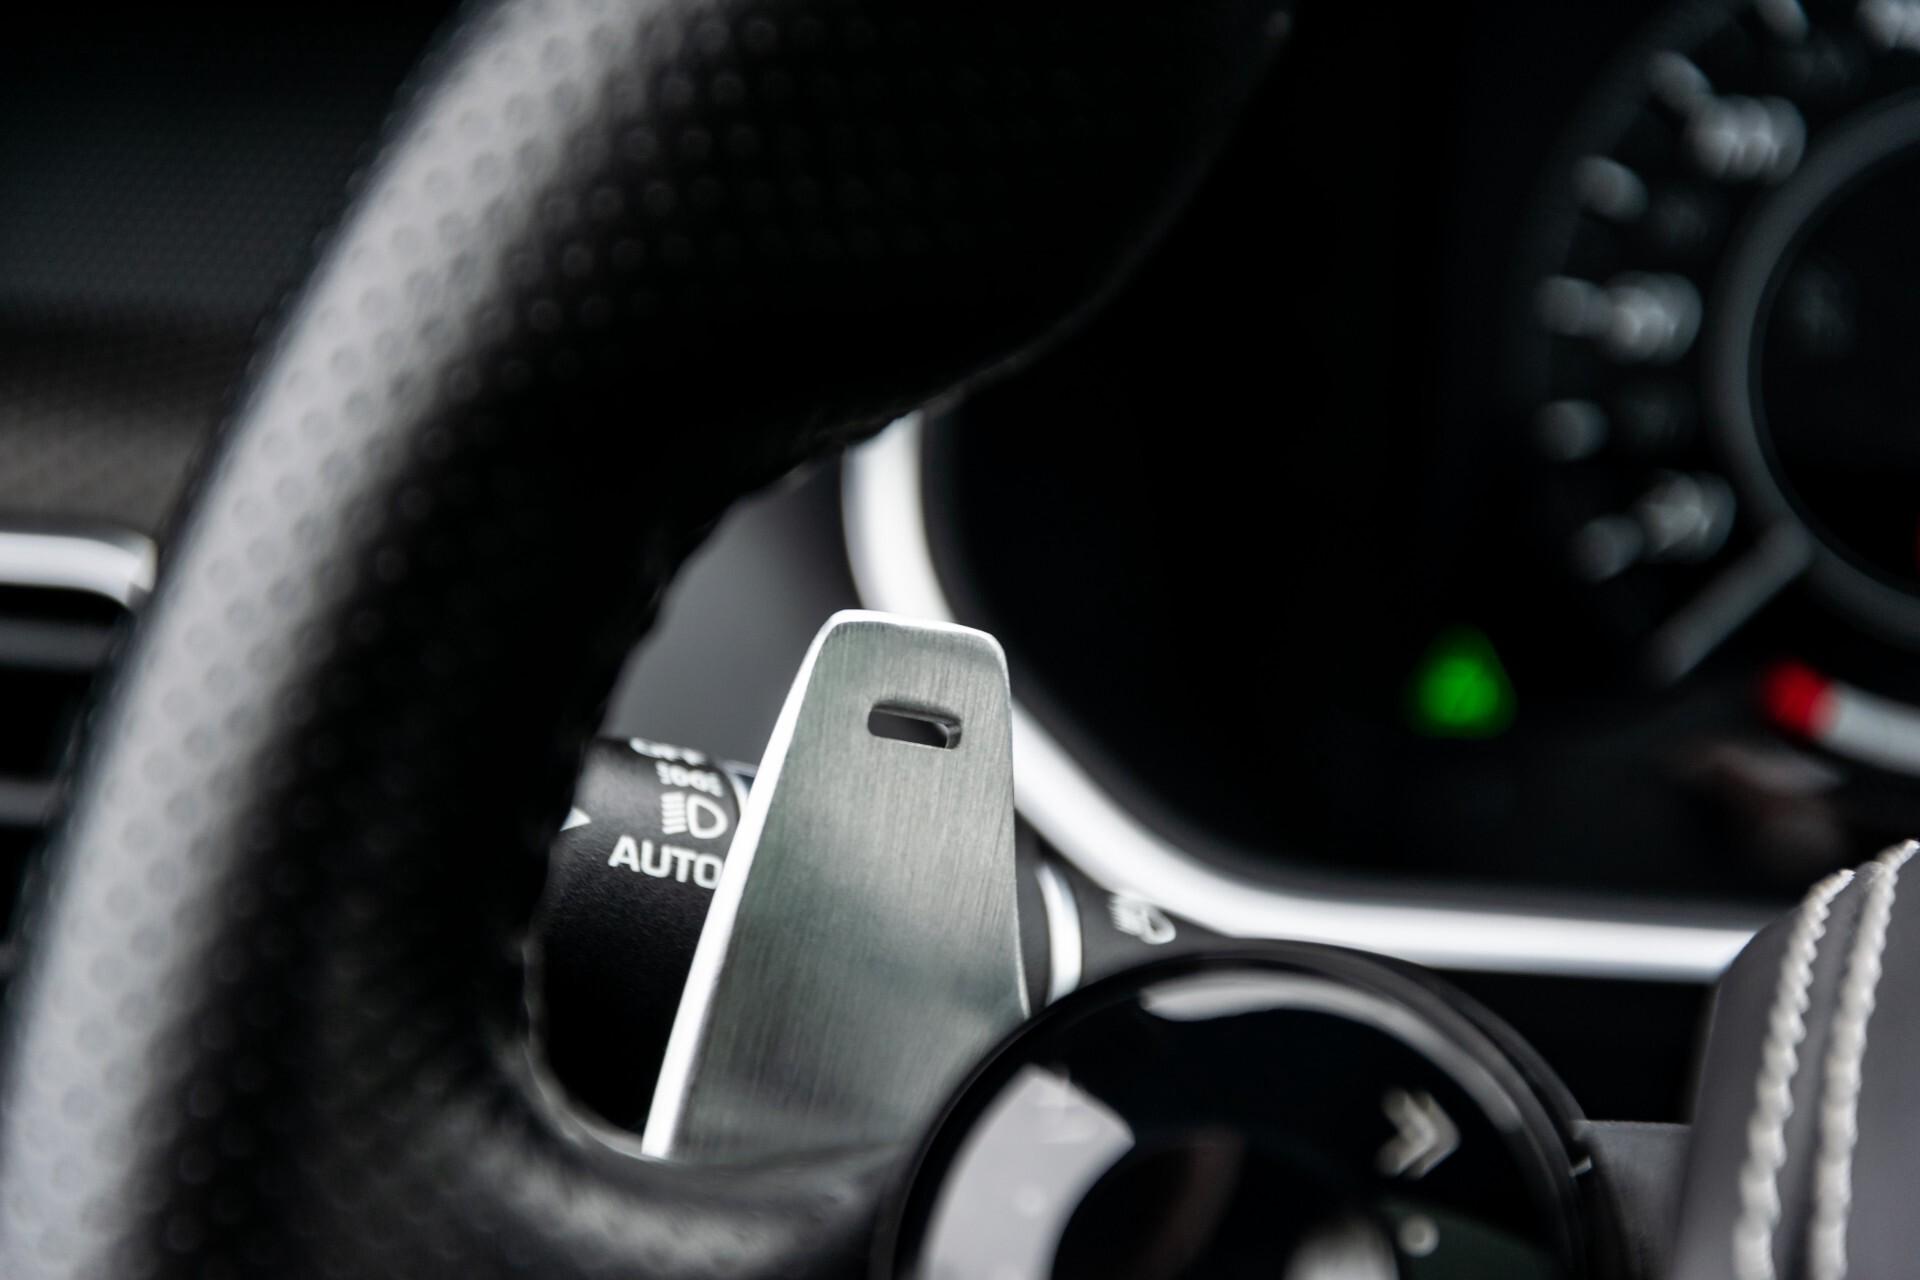 Land Rover Range Rover Sport SVR 5.0 Supercharged 575pk Full Carbon Nieuwprijs €241377 Foto 11